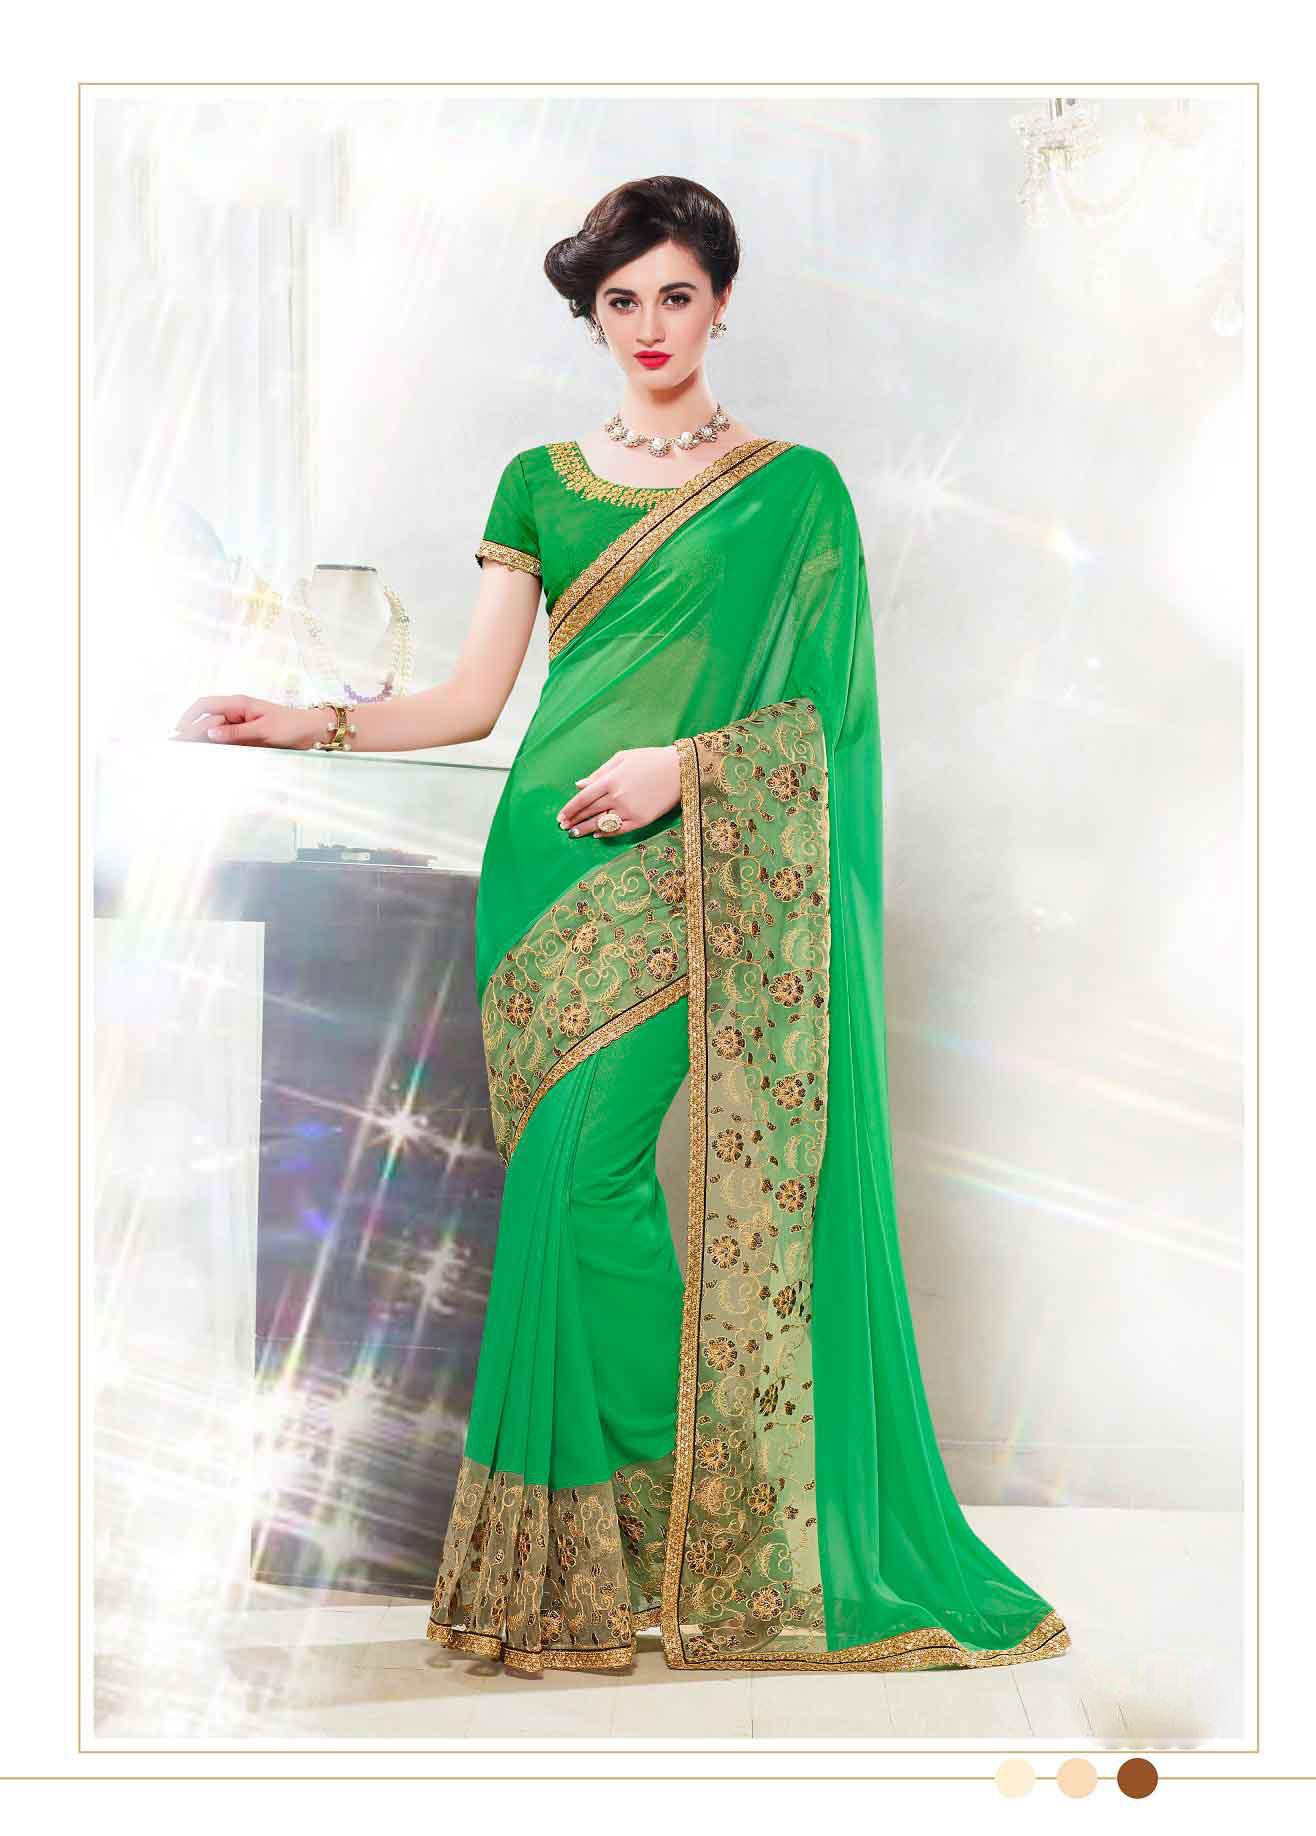 Embroidered Faux Georgette Saree (sari) in Green